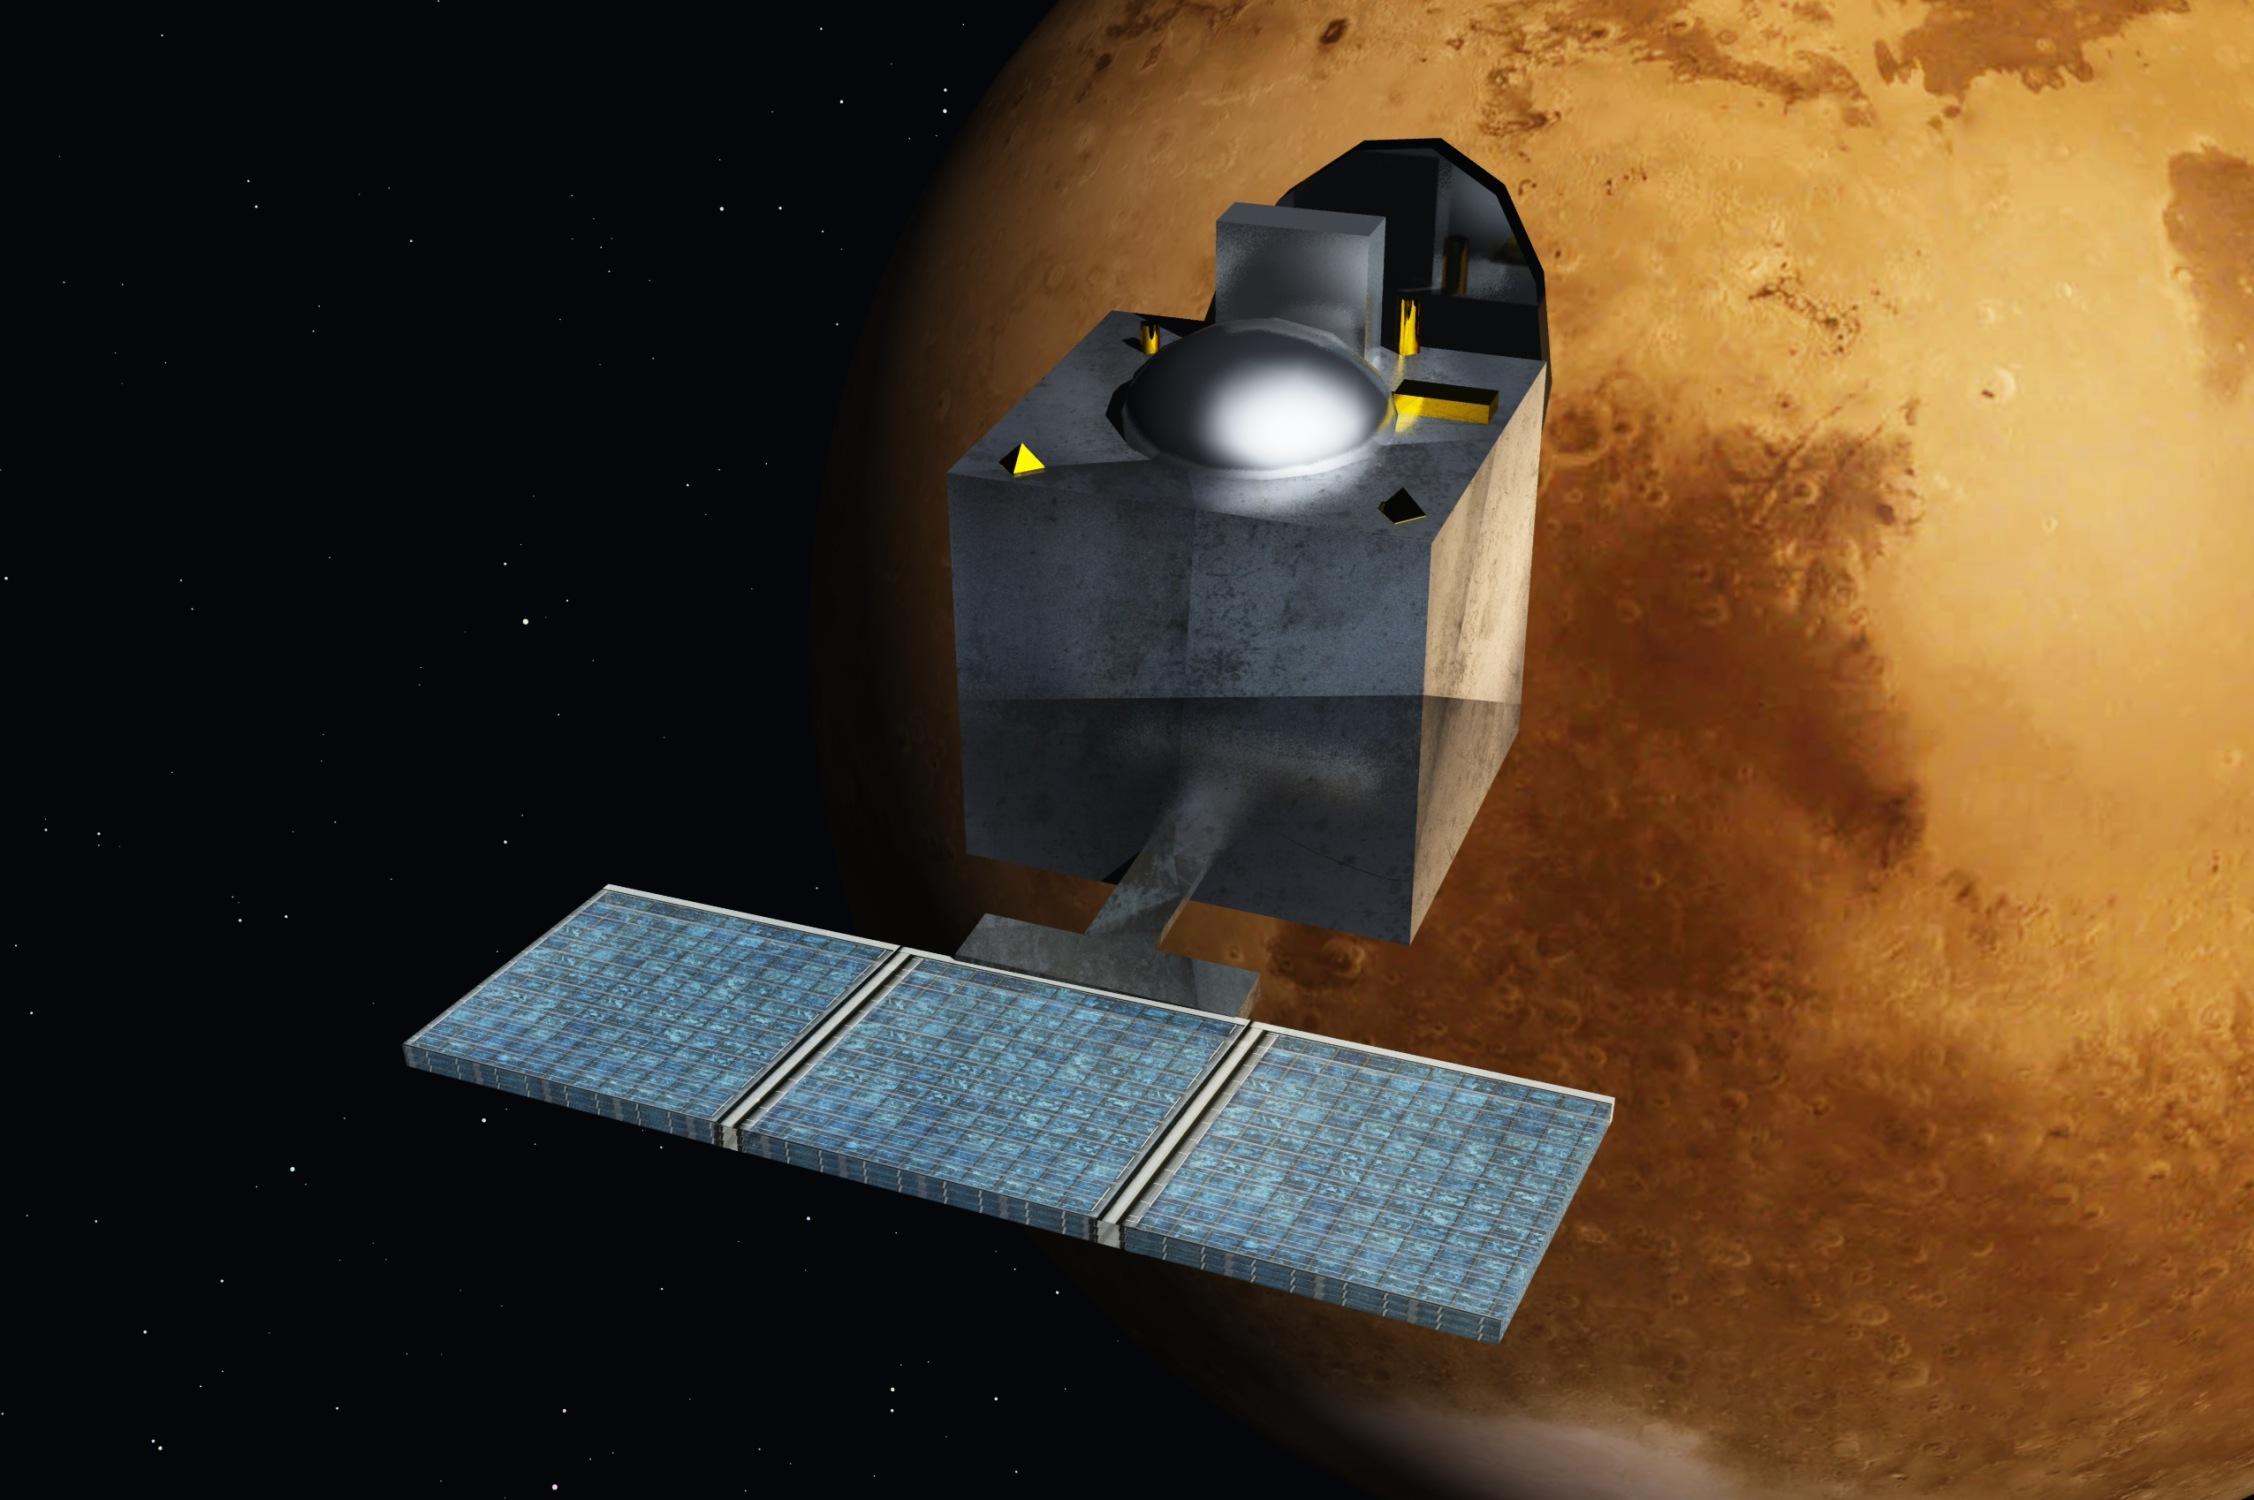 Mars orbitor (Mangalyan)